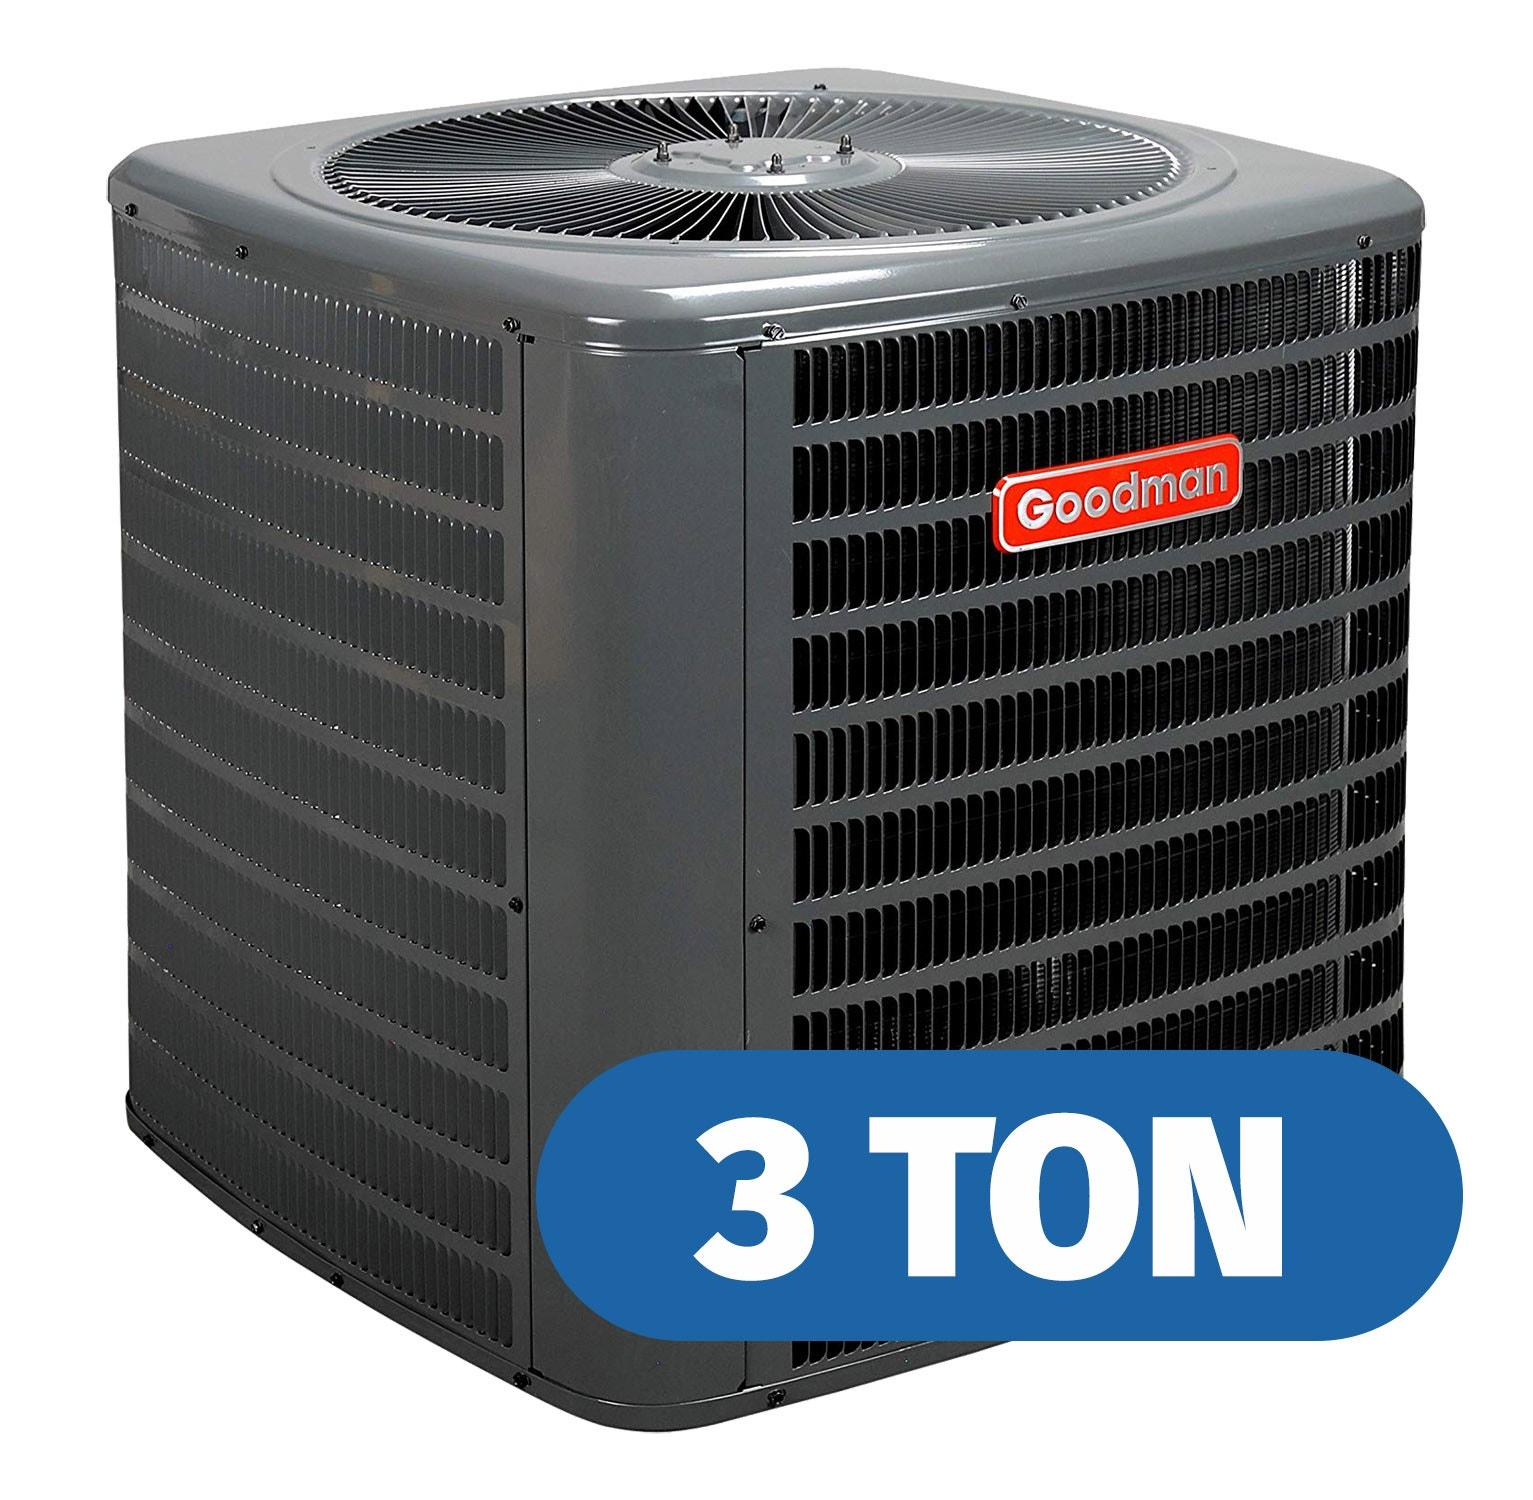 Goodman 3 Ton Heat Pumps